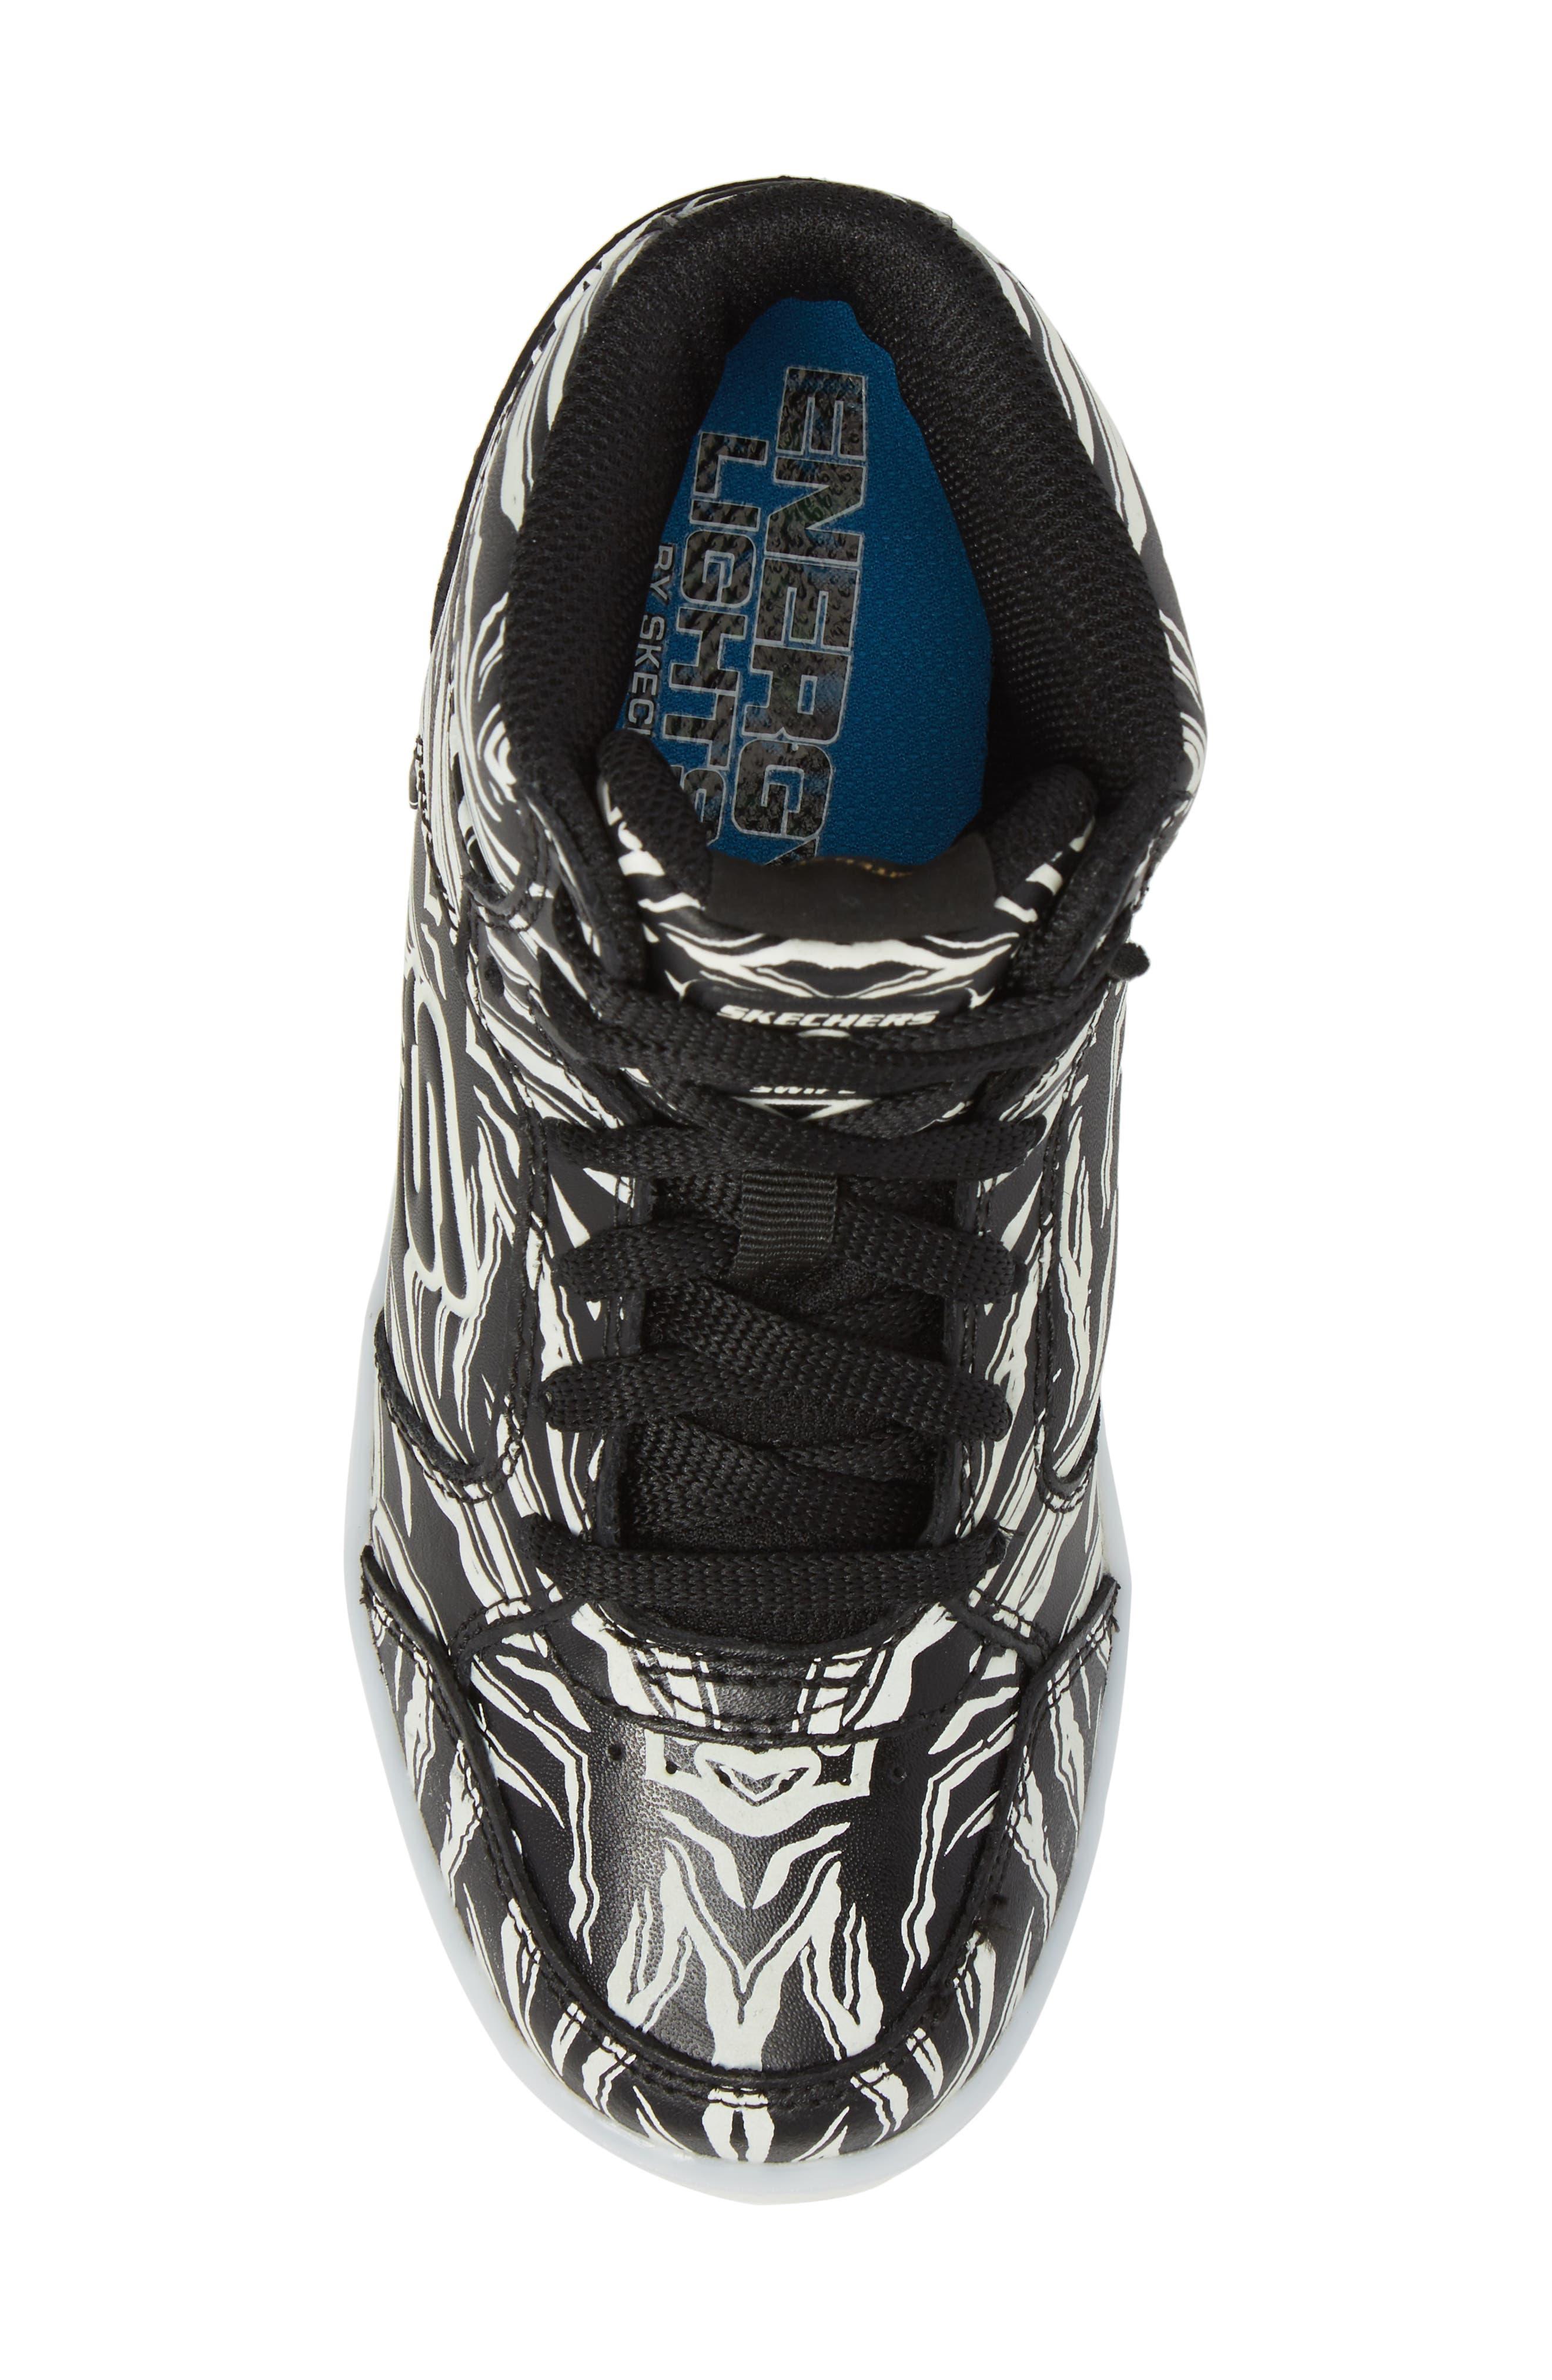 Energy Lights Glow in the Dark Sneaker,                             Alternate thumbnail 8, color,                             Black